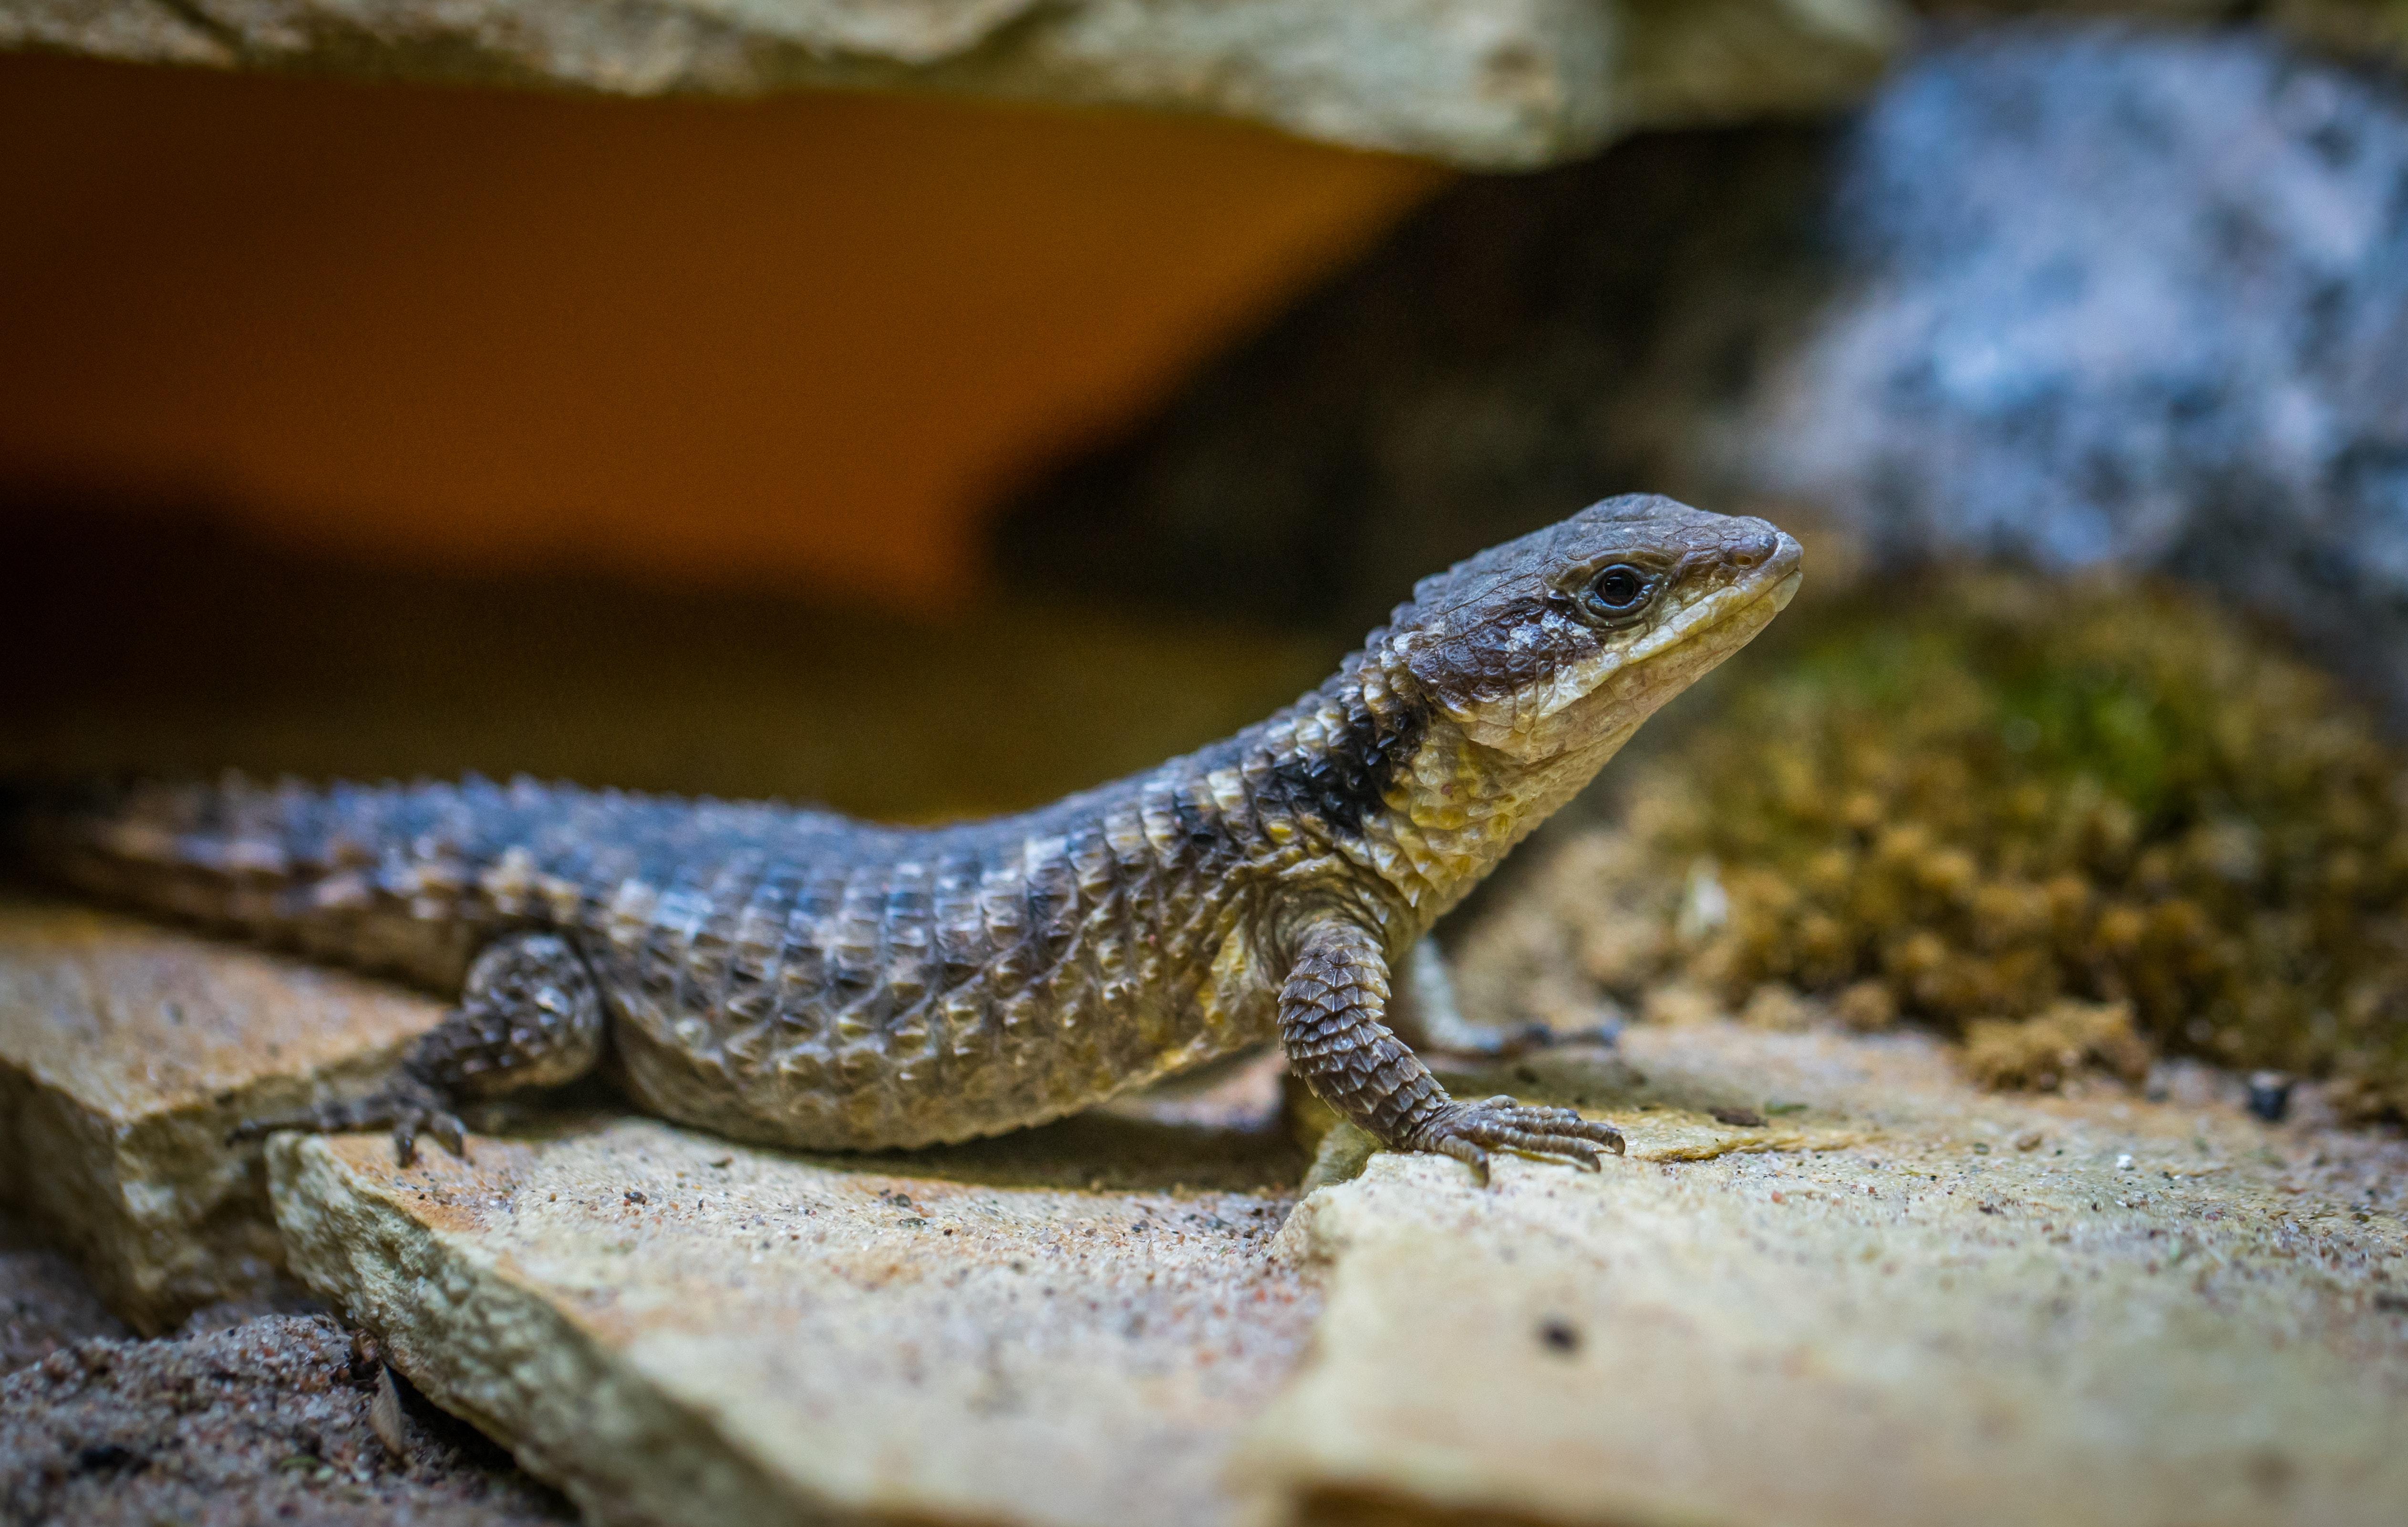 Selective Focus Photo of Black Lizard on Gray Surface, Animal, Portrait, Wildlife, Wild, HQ Photo